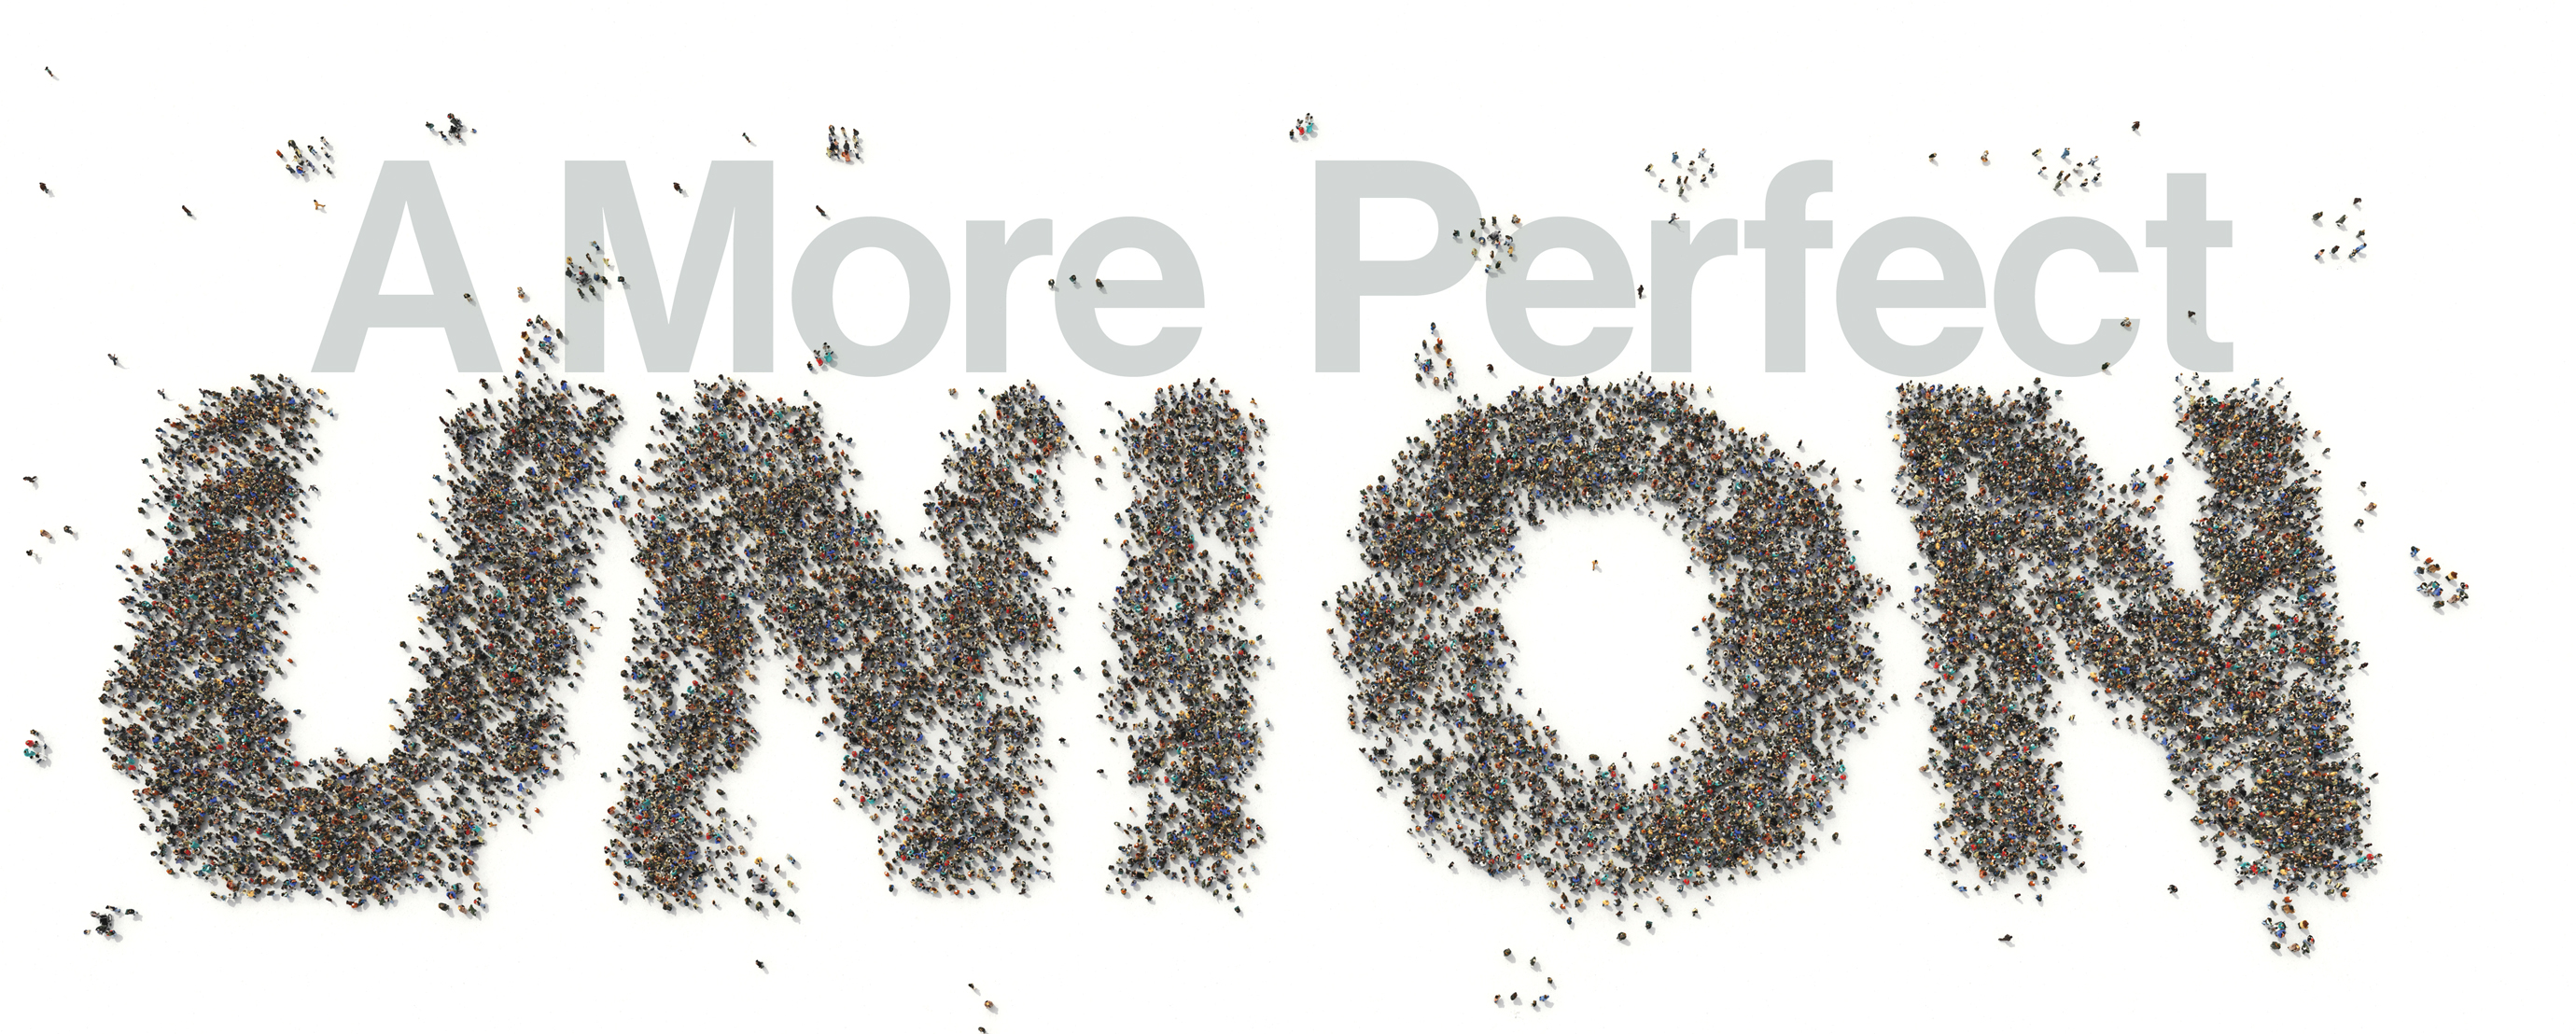 ELECTION OF BARACK OBAMA MILLION DOLLAR SUPPORT THE 2012 RE Lot of 100 BILLS